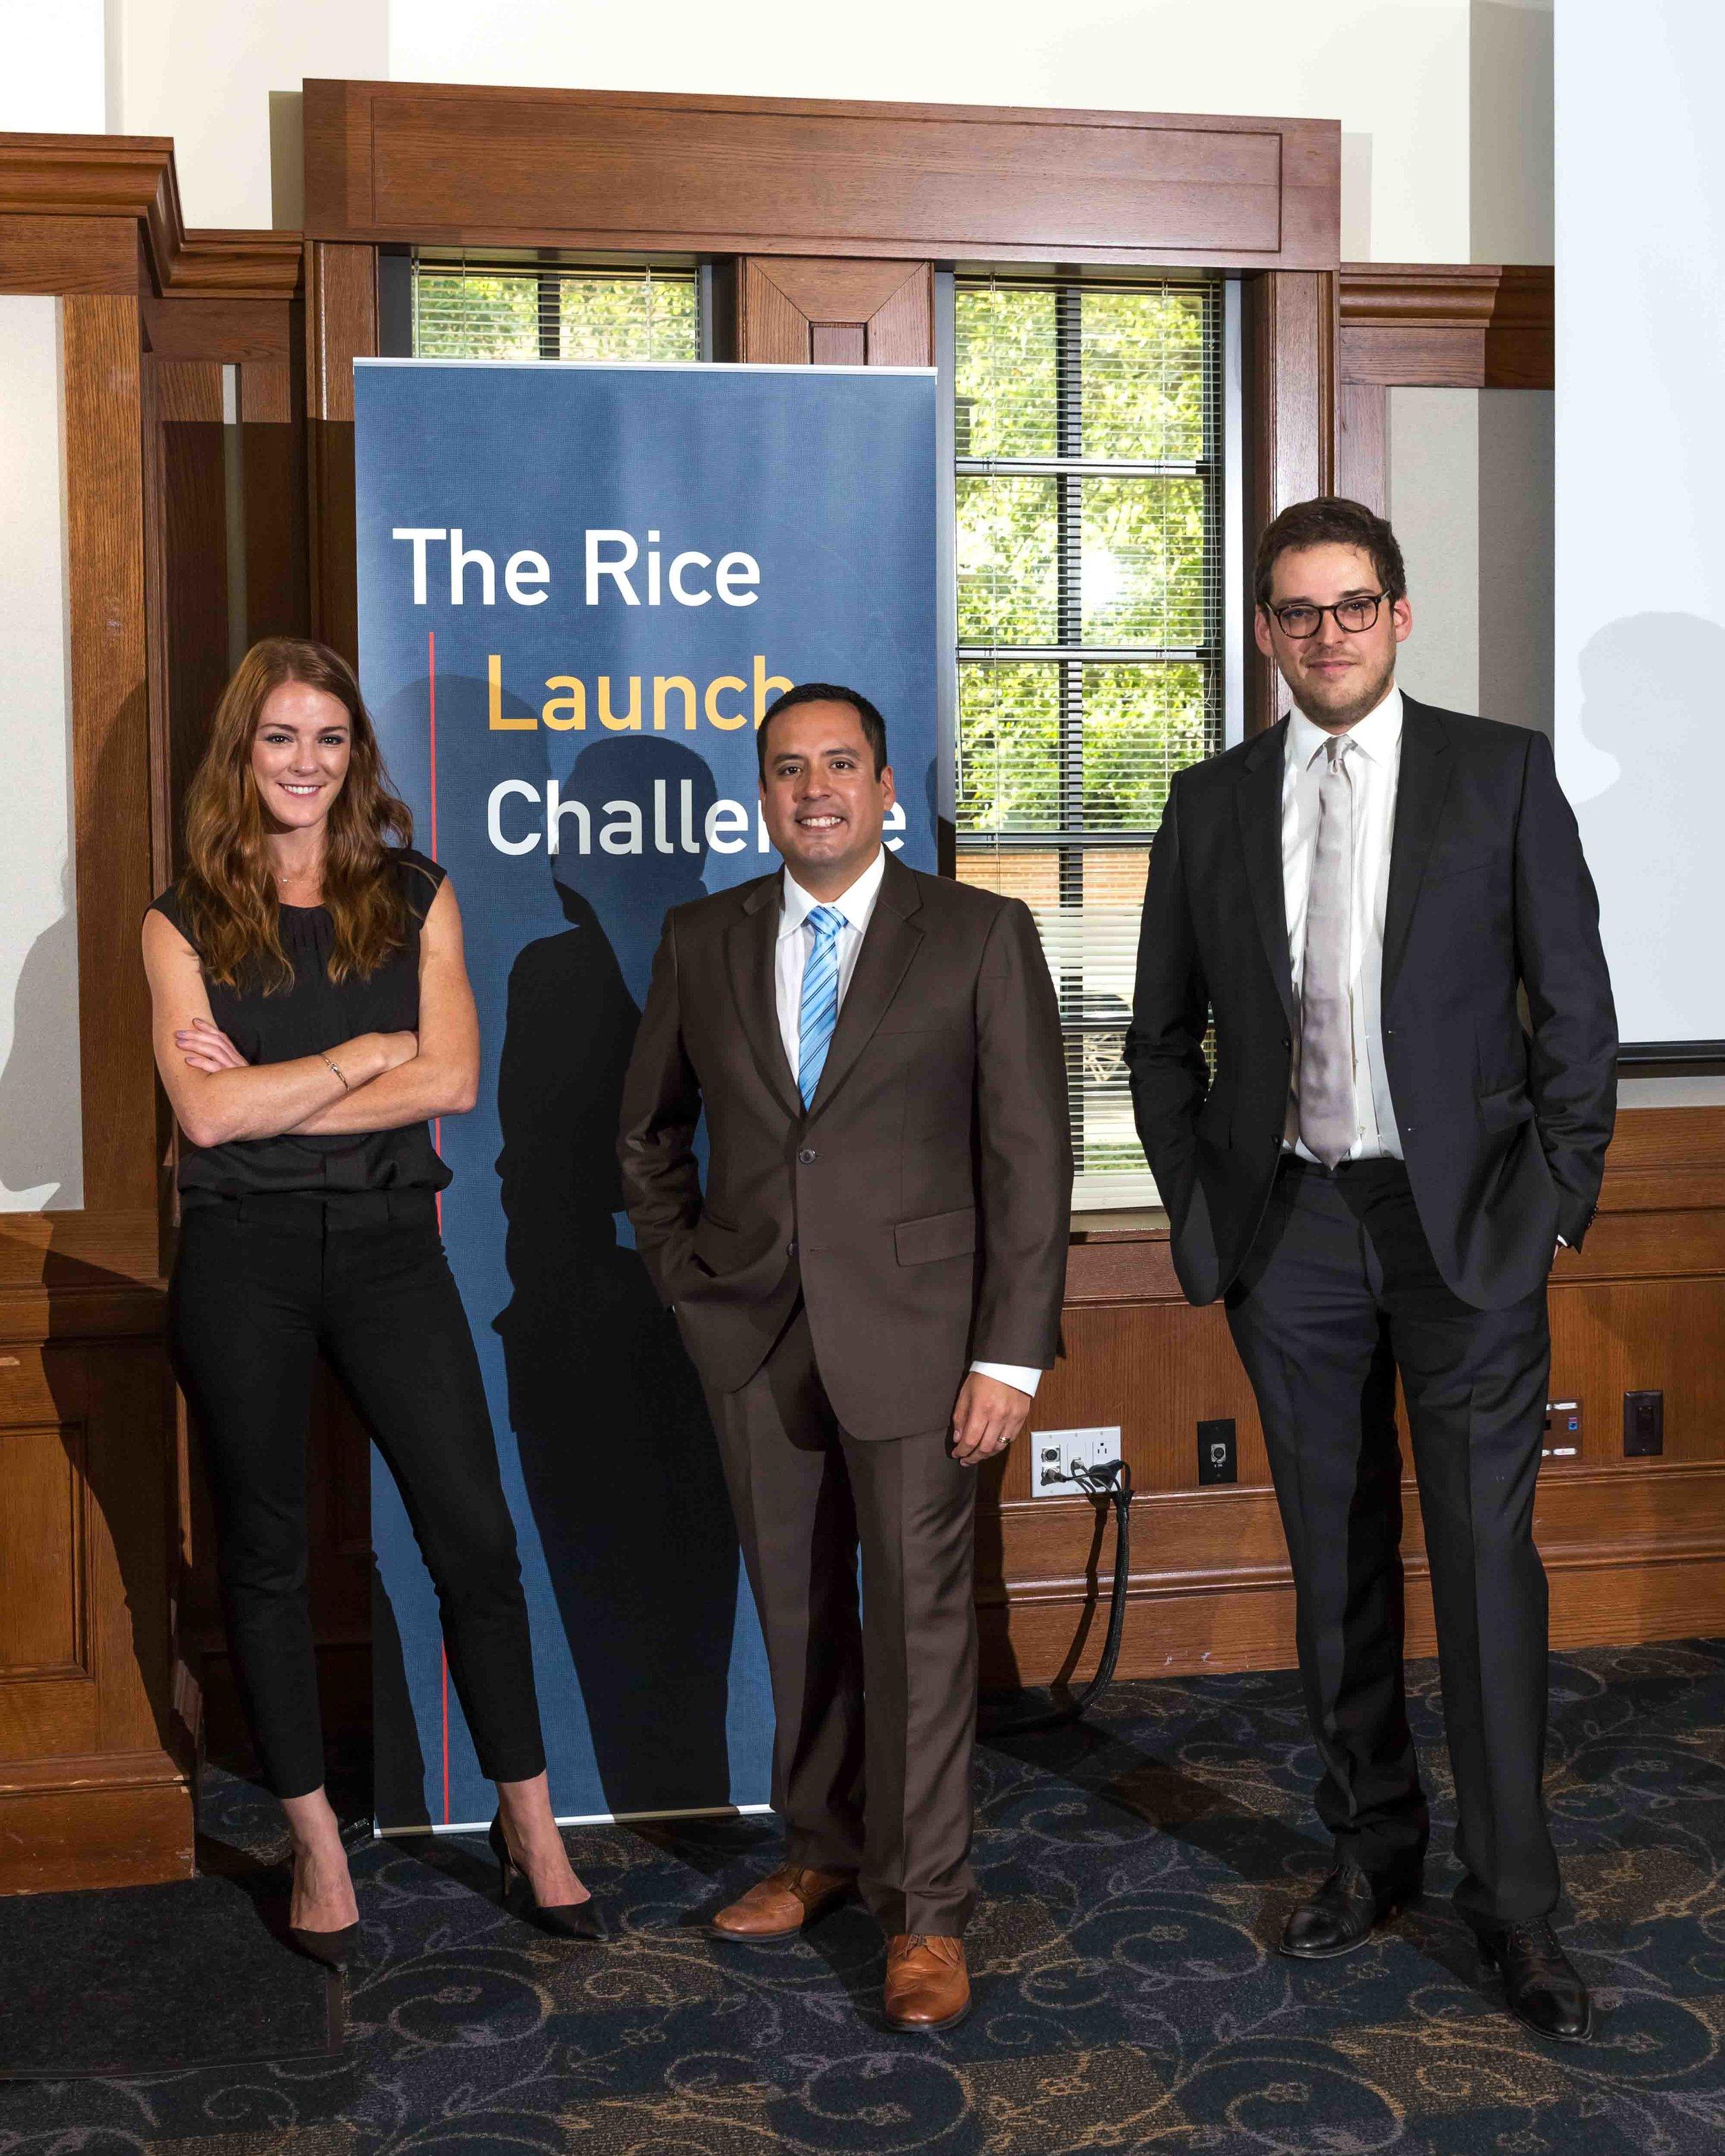 Rice University - Launch Challenge 29Mar2017-7Rice University - Launch Challenge 29Mar2017.JPG